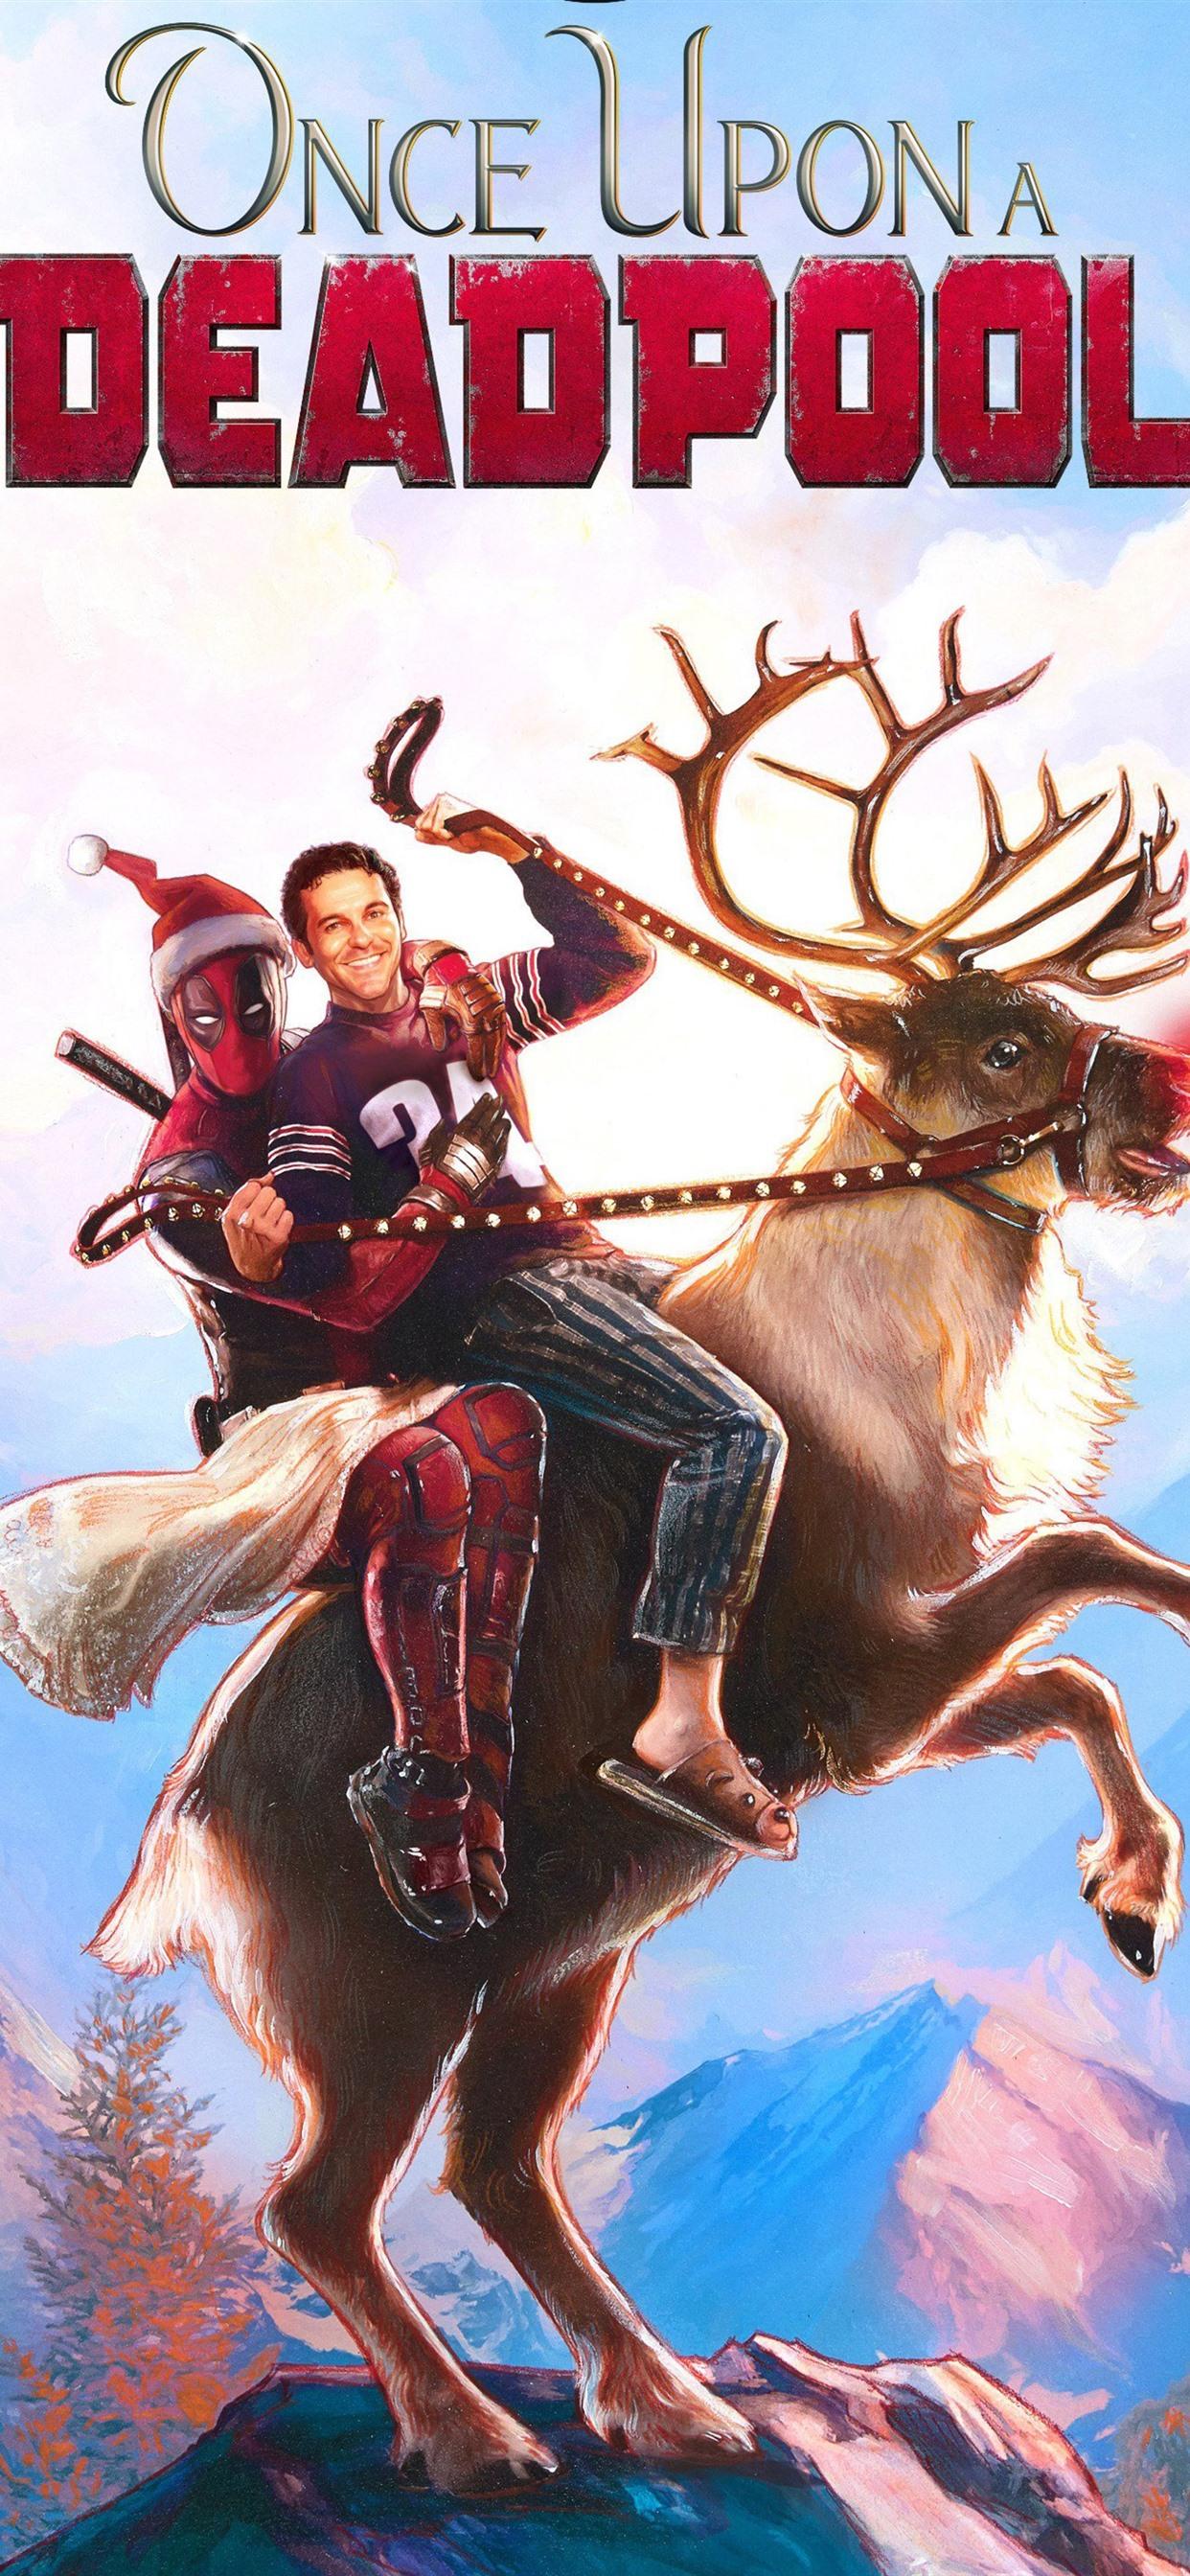 Deadpool 2 Superhero Deer Christmas 1242x2688 Iphone Xs Max